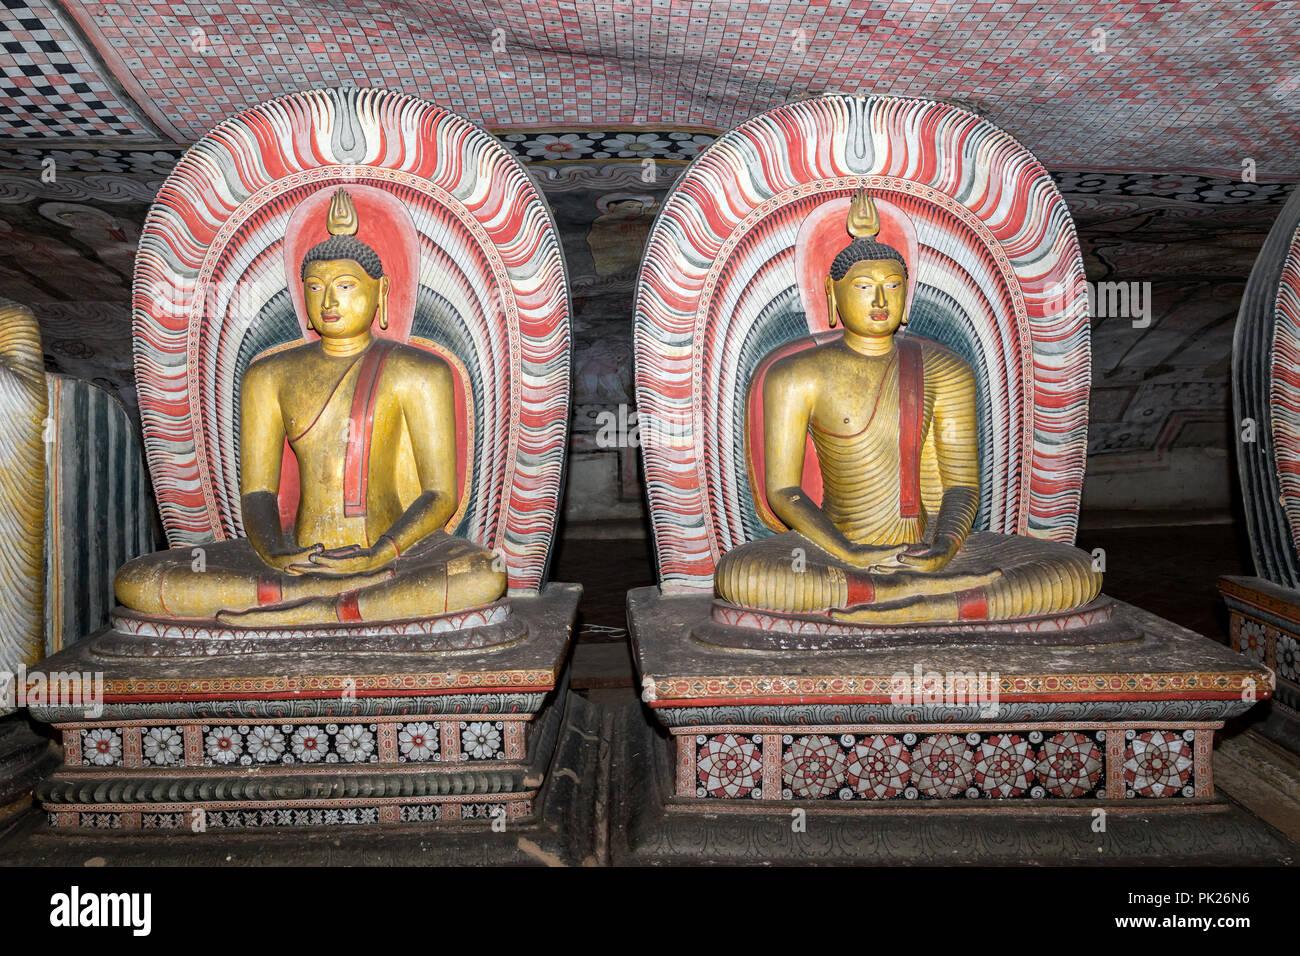 Buddha figures, Cave of the Great Kings, Dambulla Cave temple, Sri Lanka - Stock Image